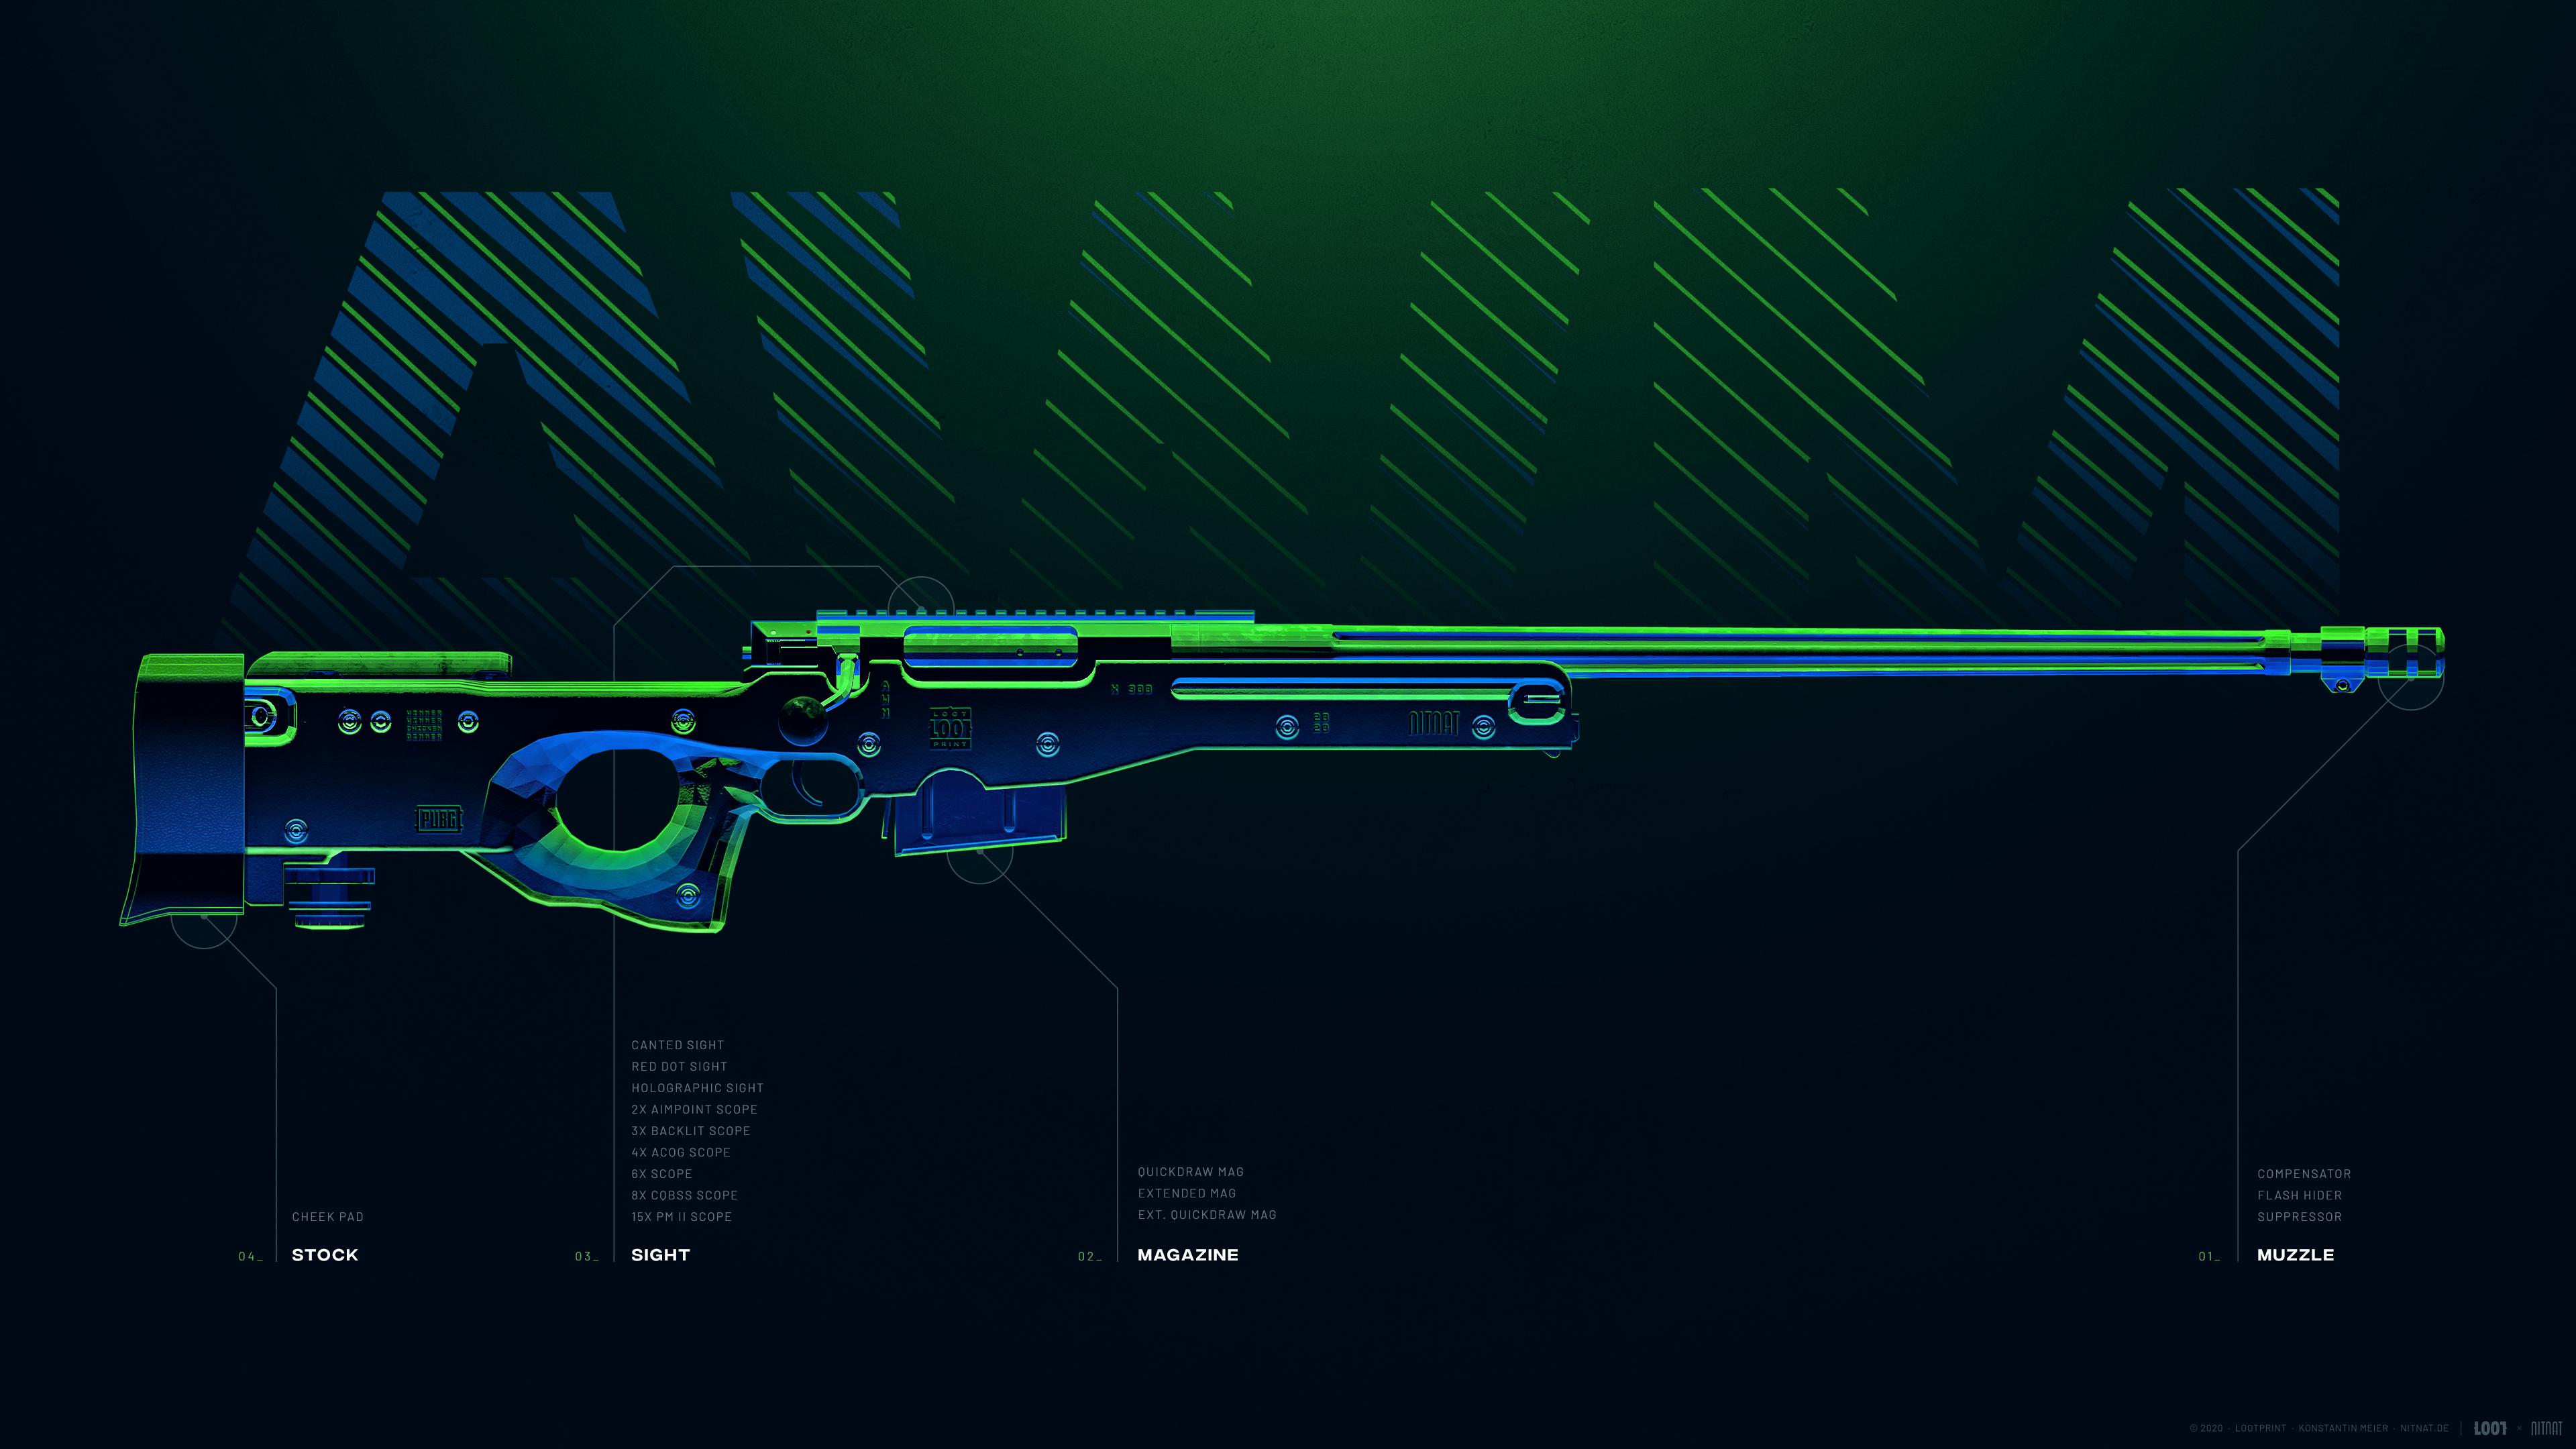 Fondos de pantalla Arma AWM de PUBG